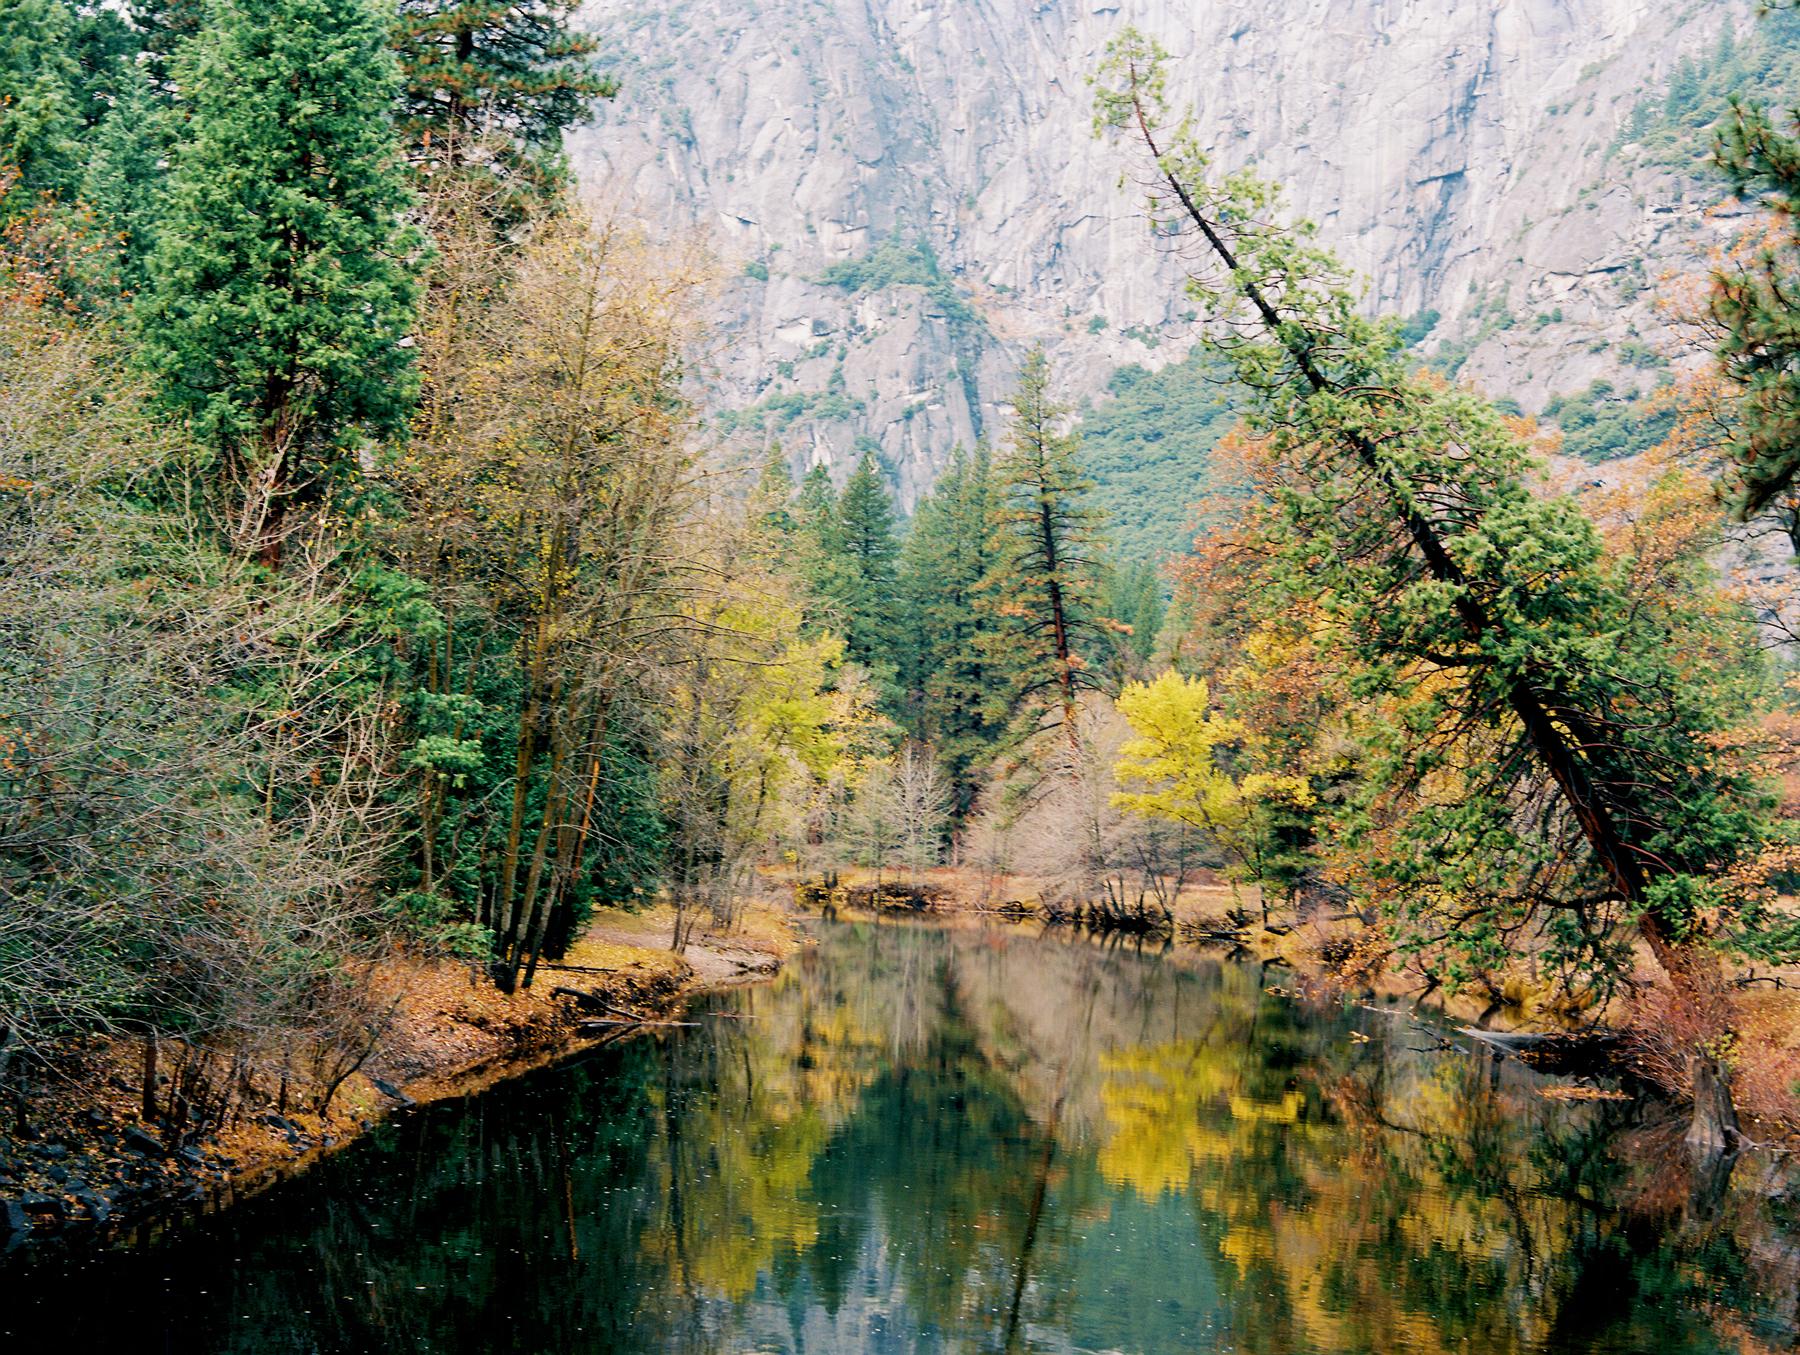 05sRGB-Inna-Kostukovsky-Yosemite3.jpg